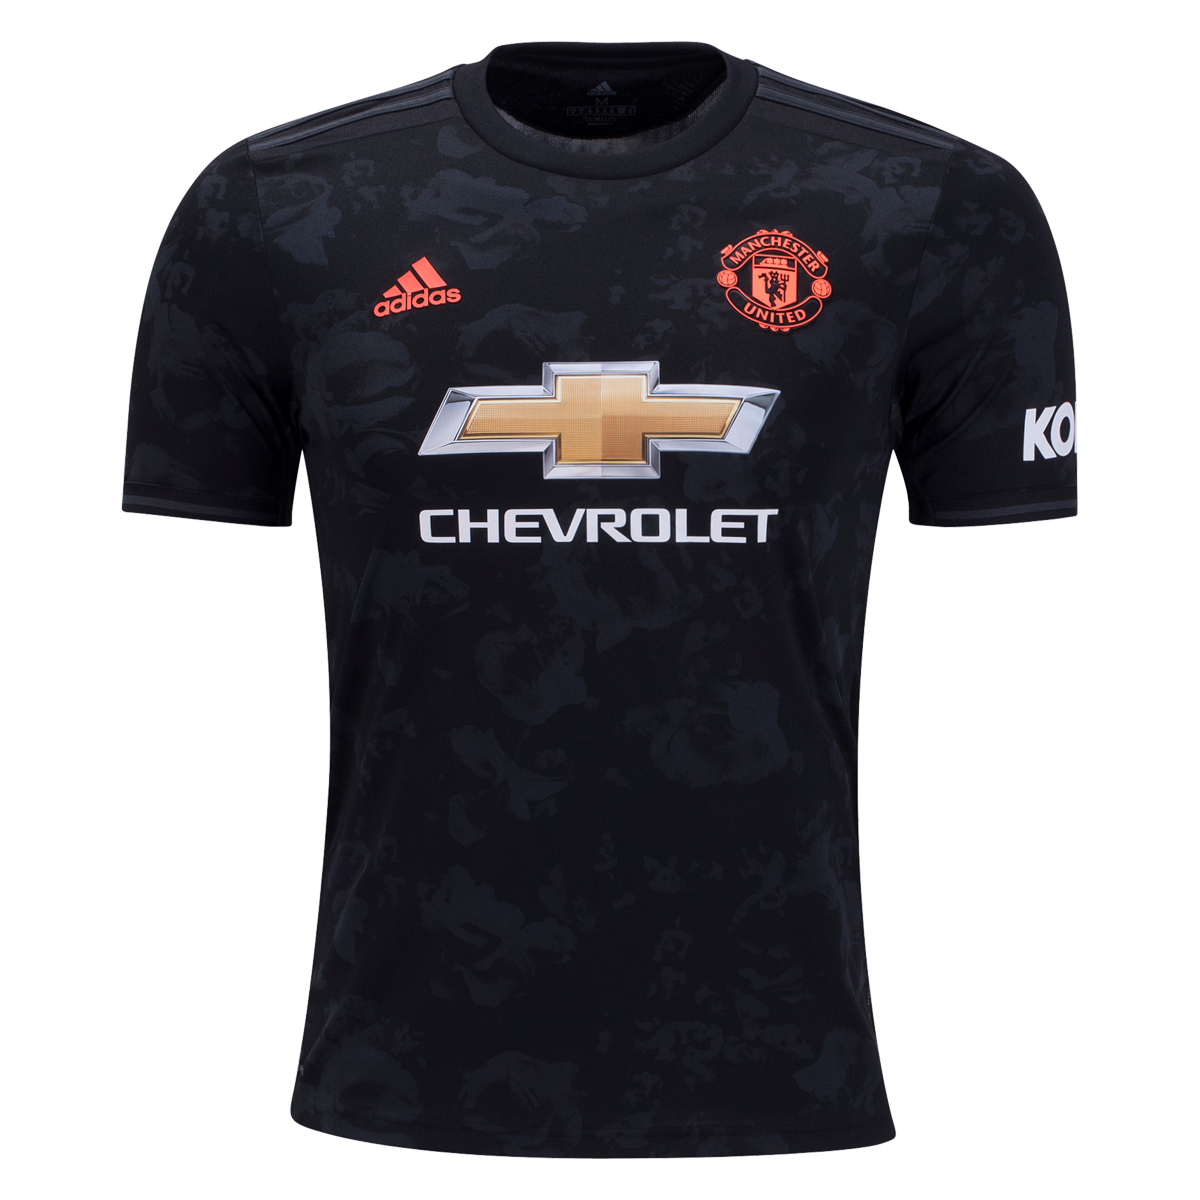 Adidas Manchester United Third Jersey 19 20 3xl Manchester United Manchester United Shirt Adidas